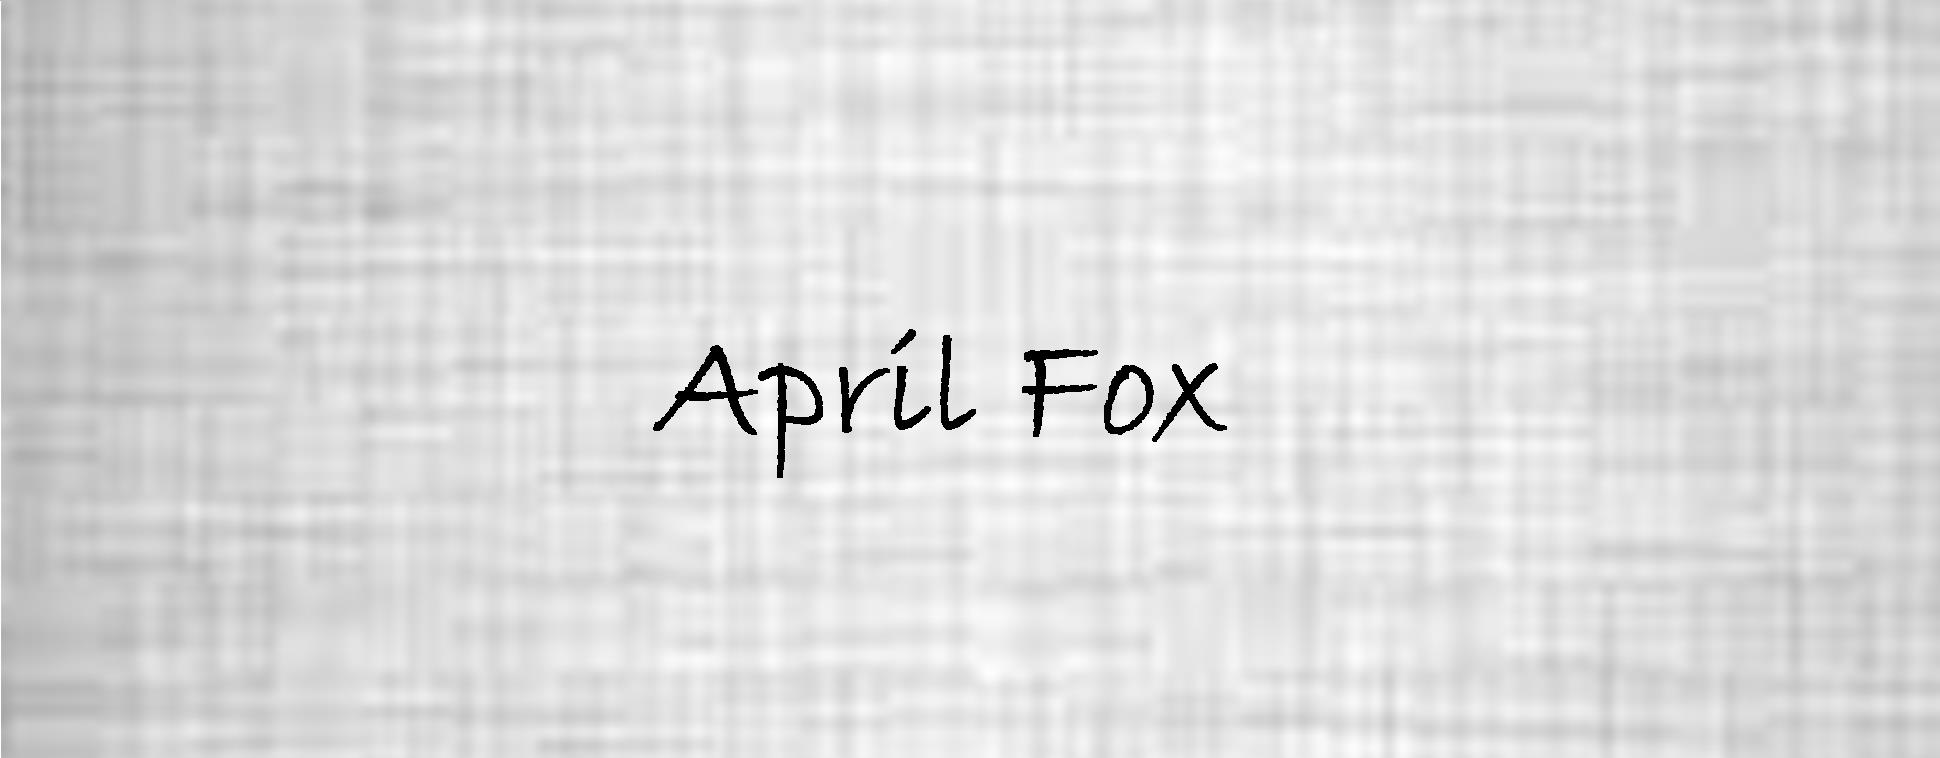 April Fox.jpg